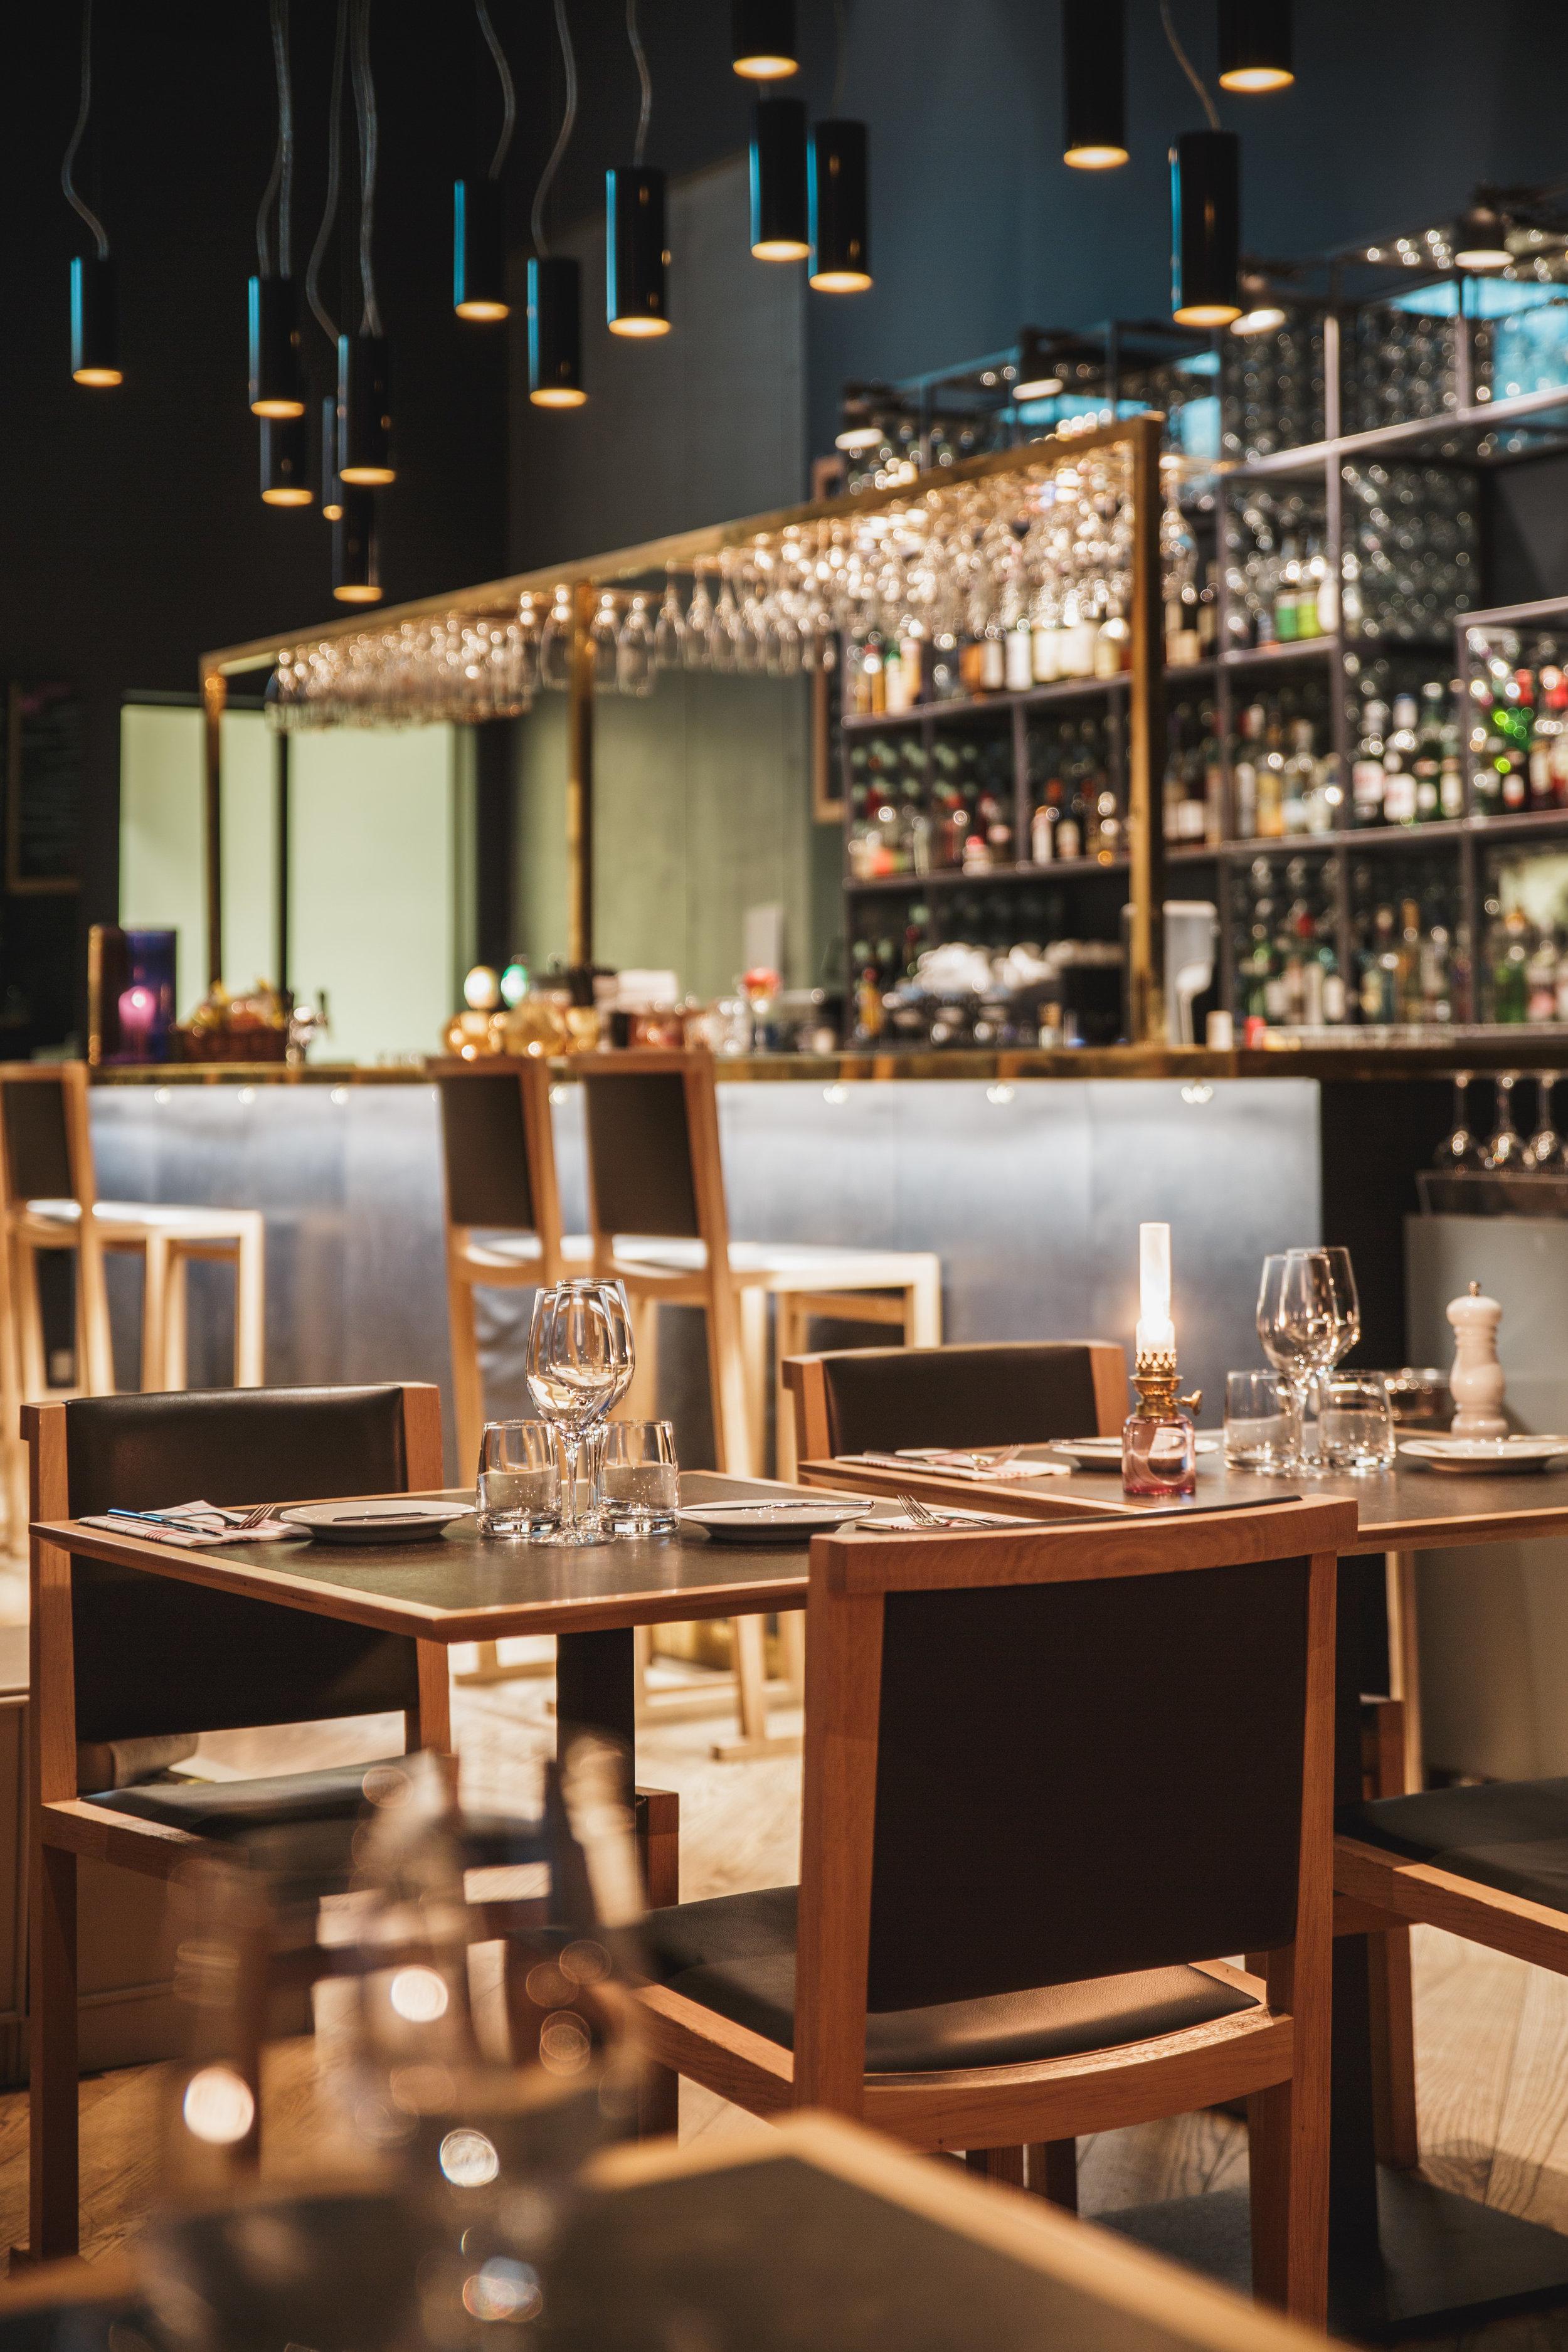 Quality-Hotel-Friends-BrasserieX-table-bar.jpg